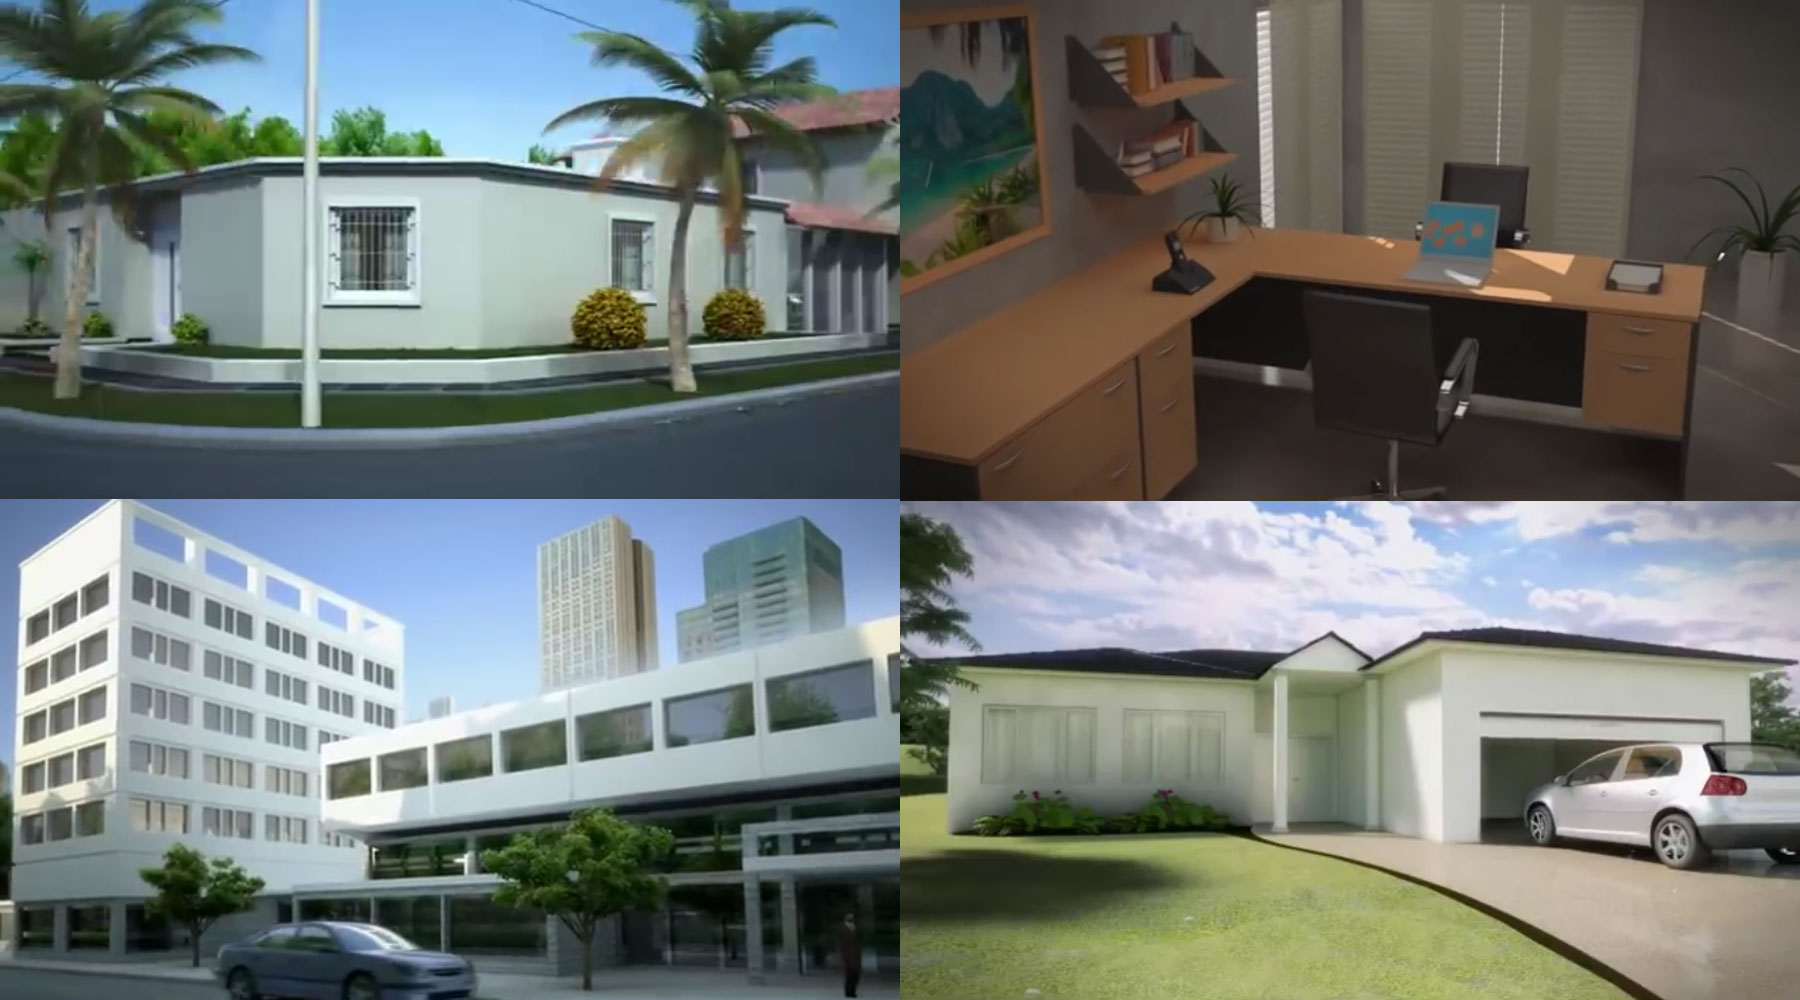 Architecture Visualizations